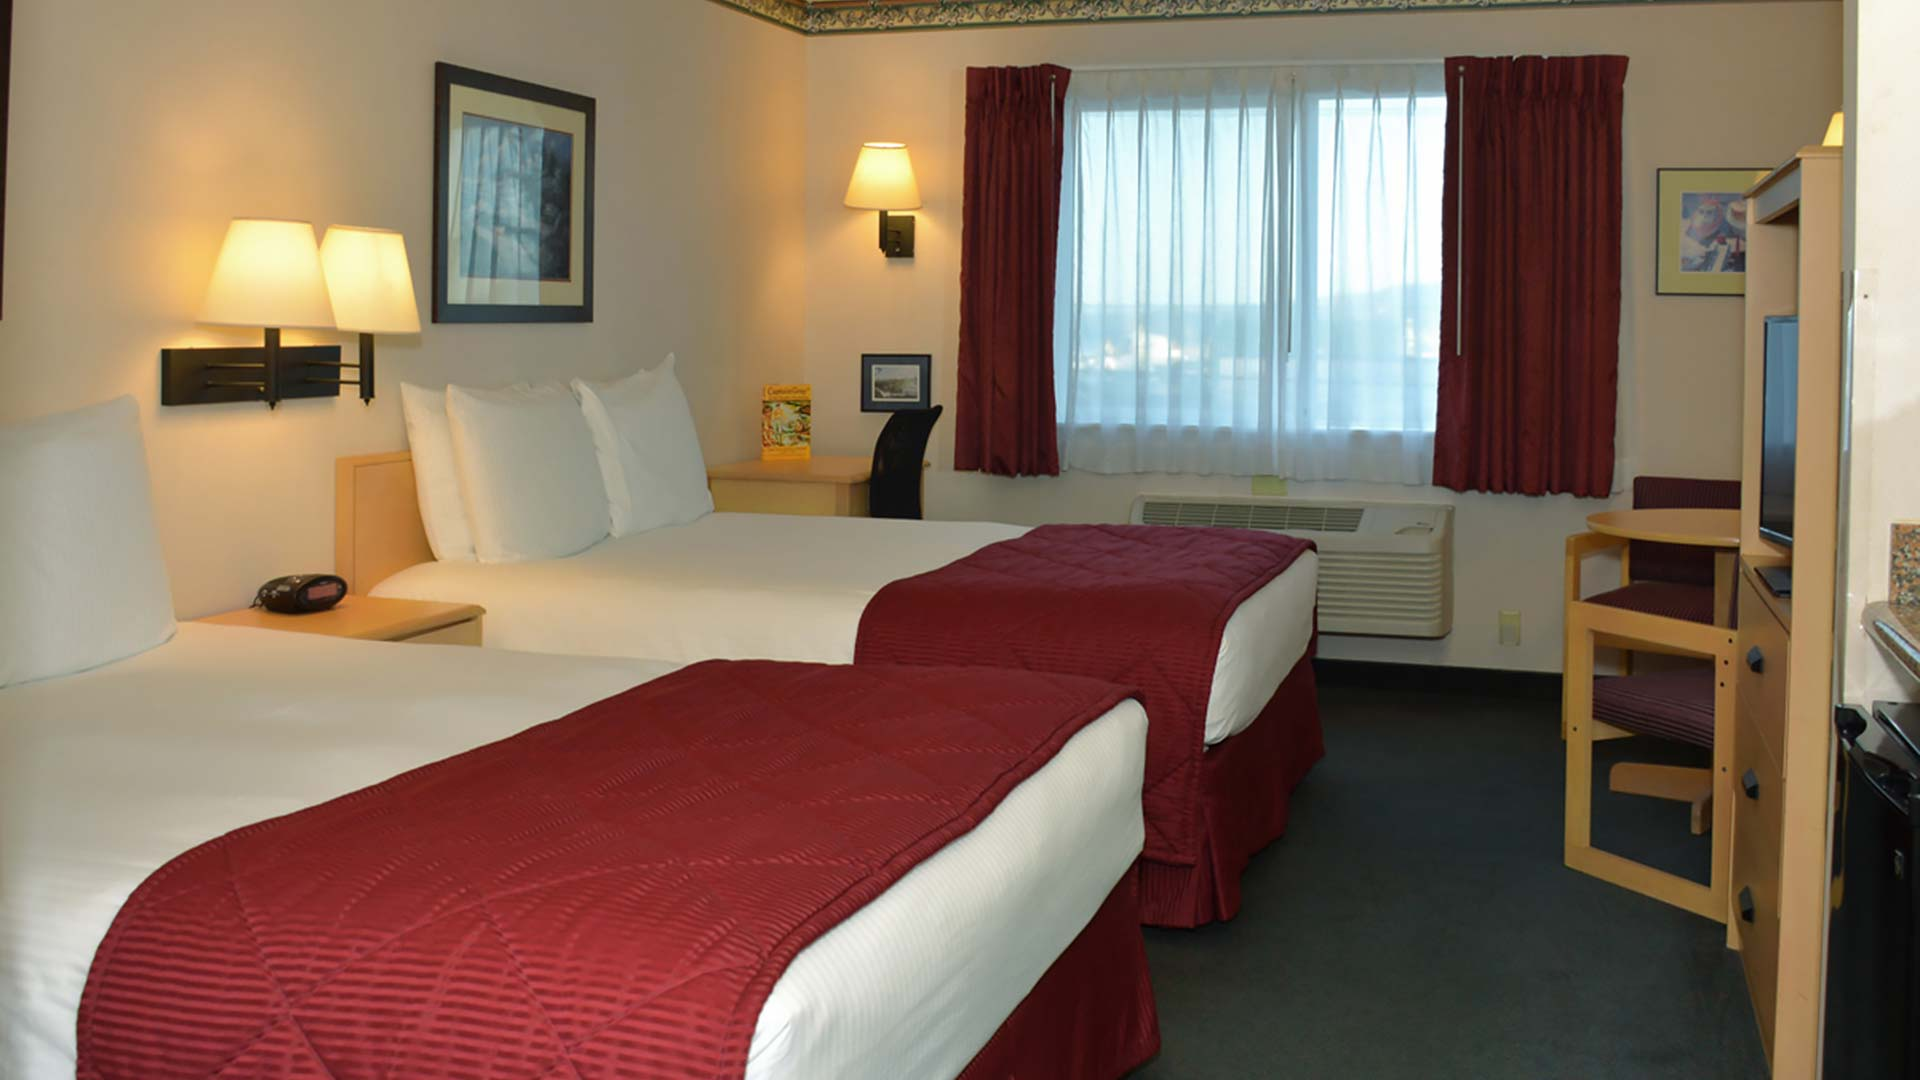 Garibaldi House Lodging Hotels Motels